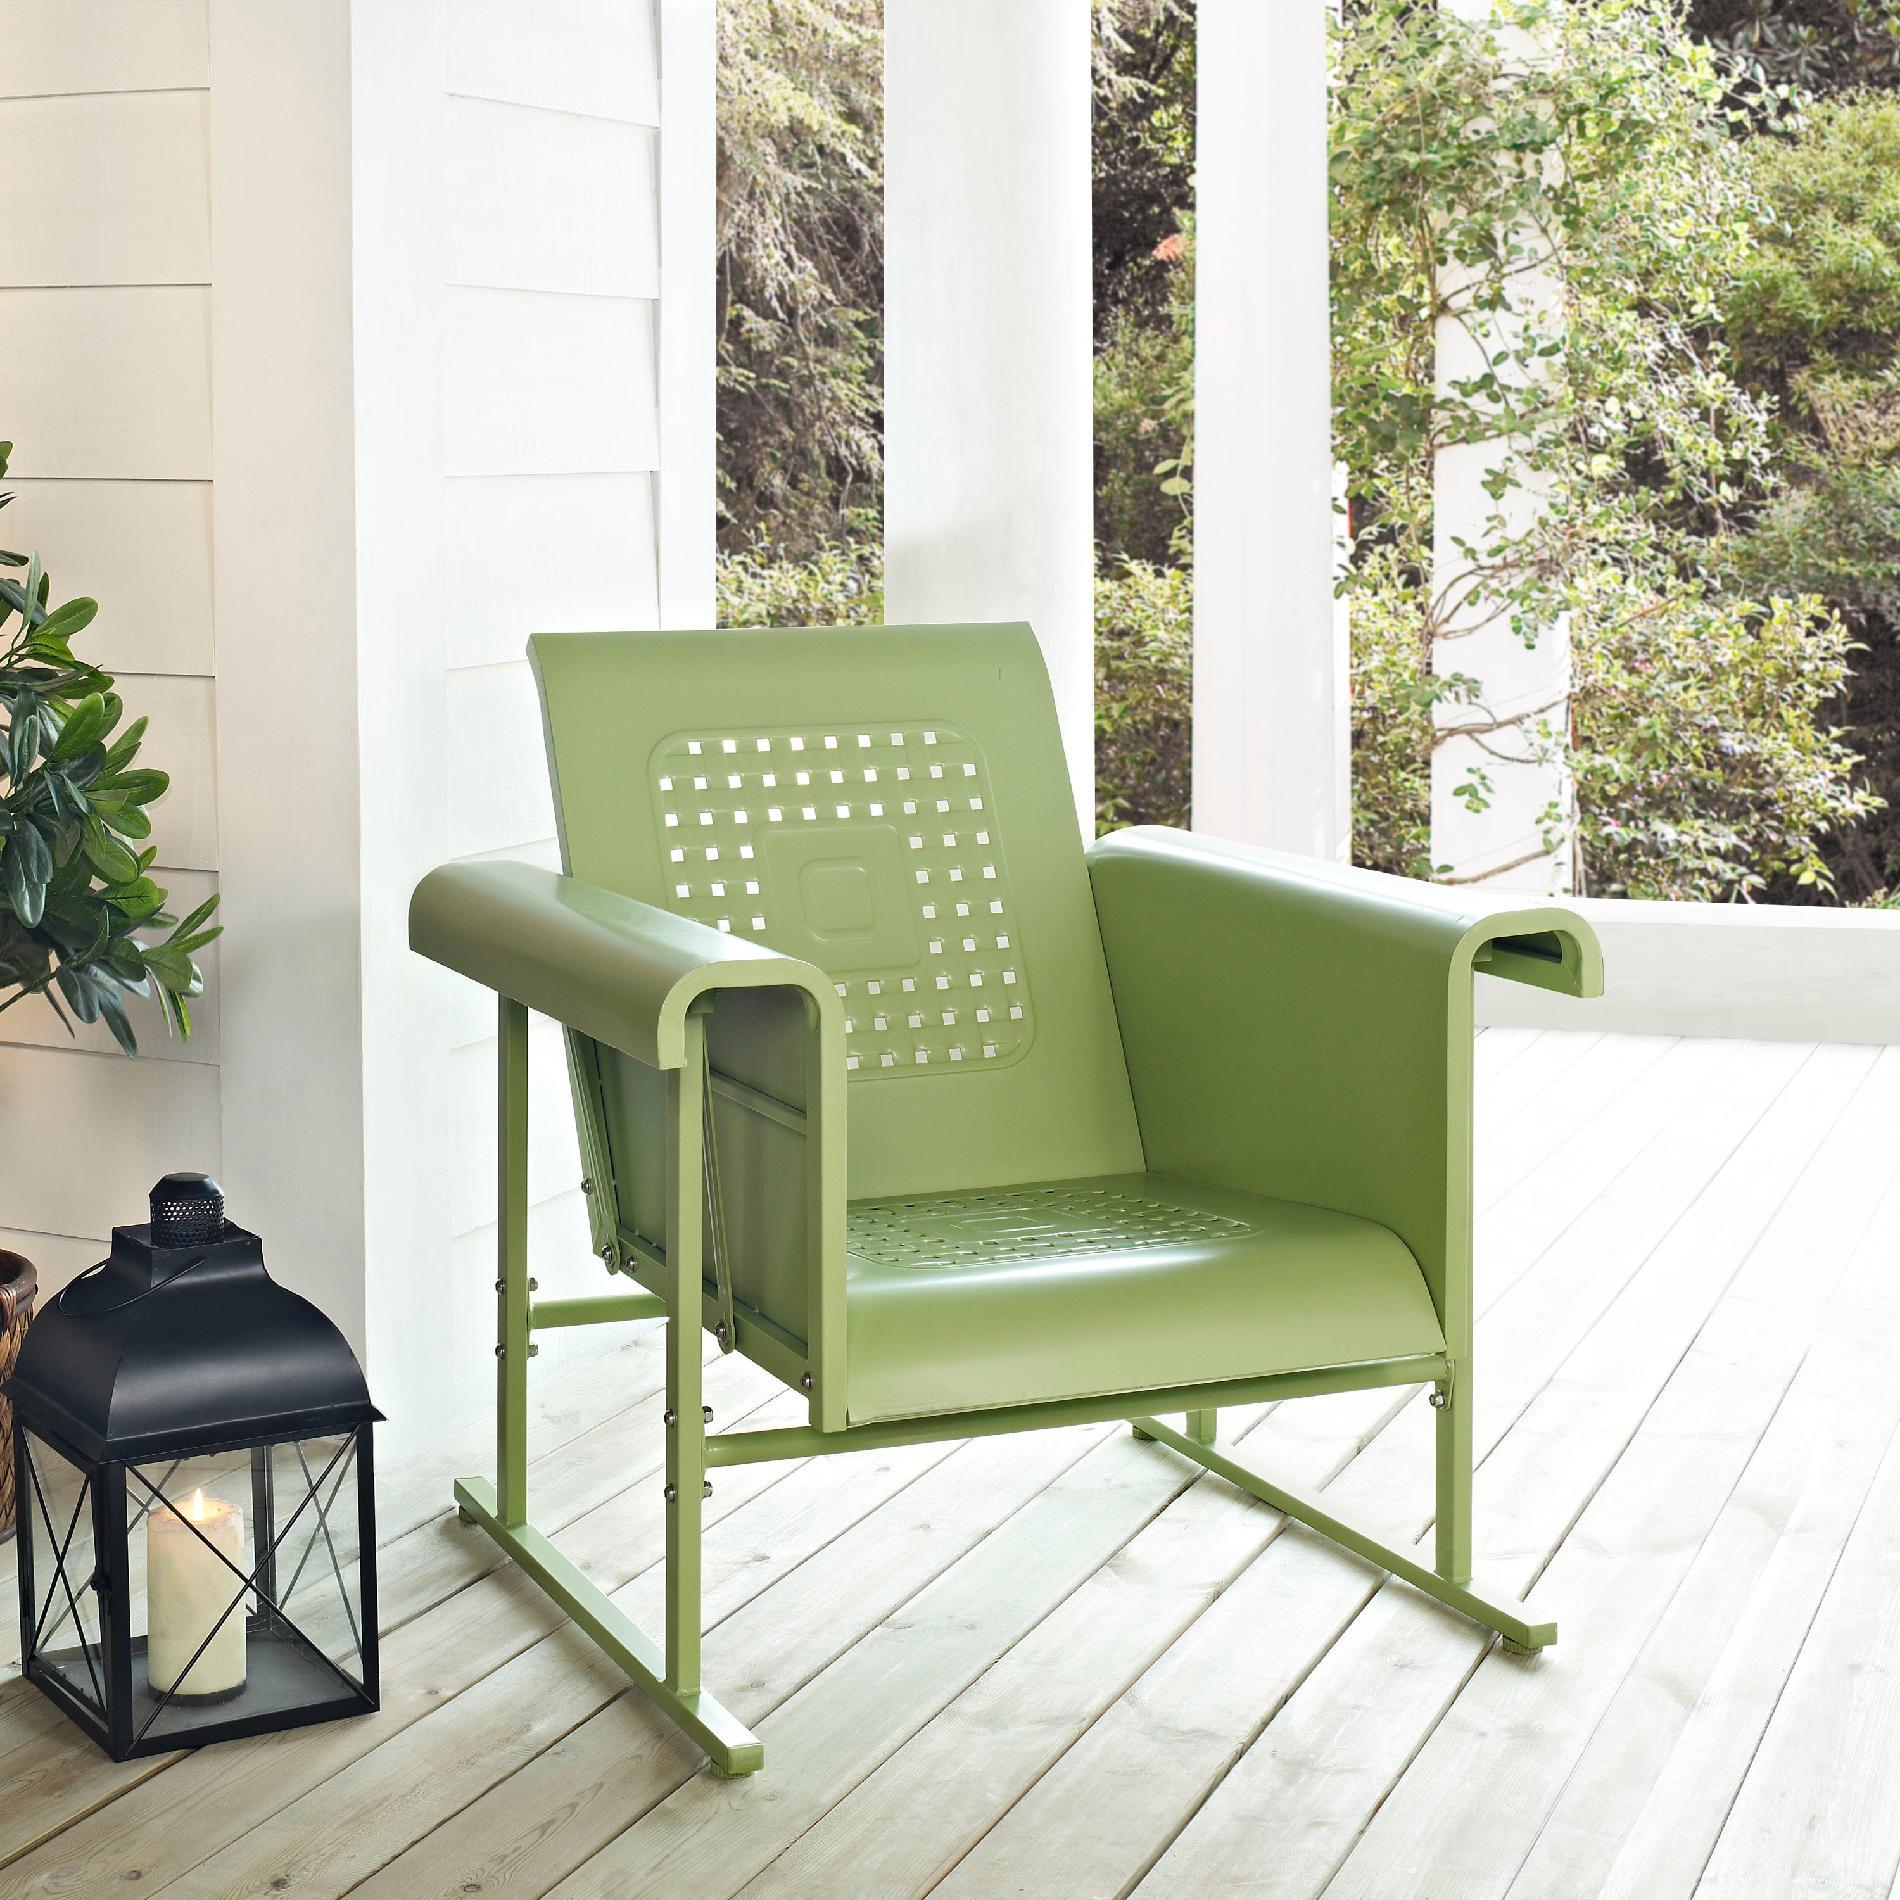 Crosley Outdoor Veranda Single Glider Chair In Assorted Colors